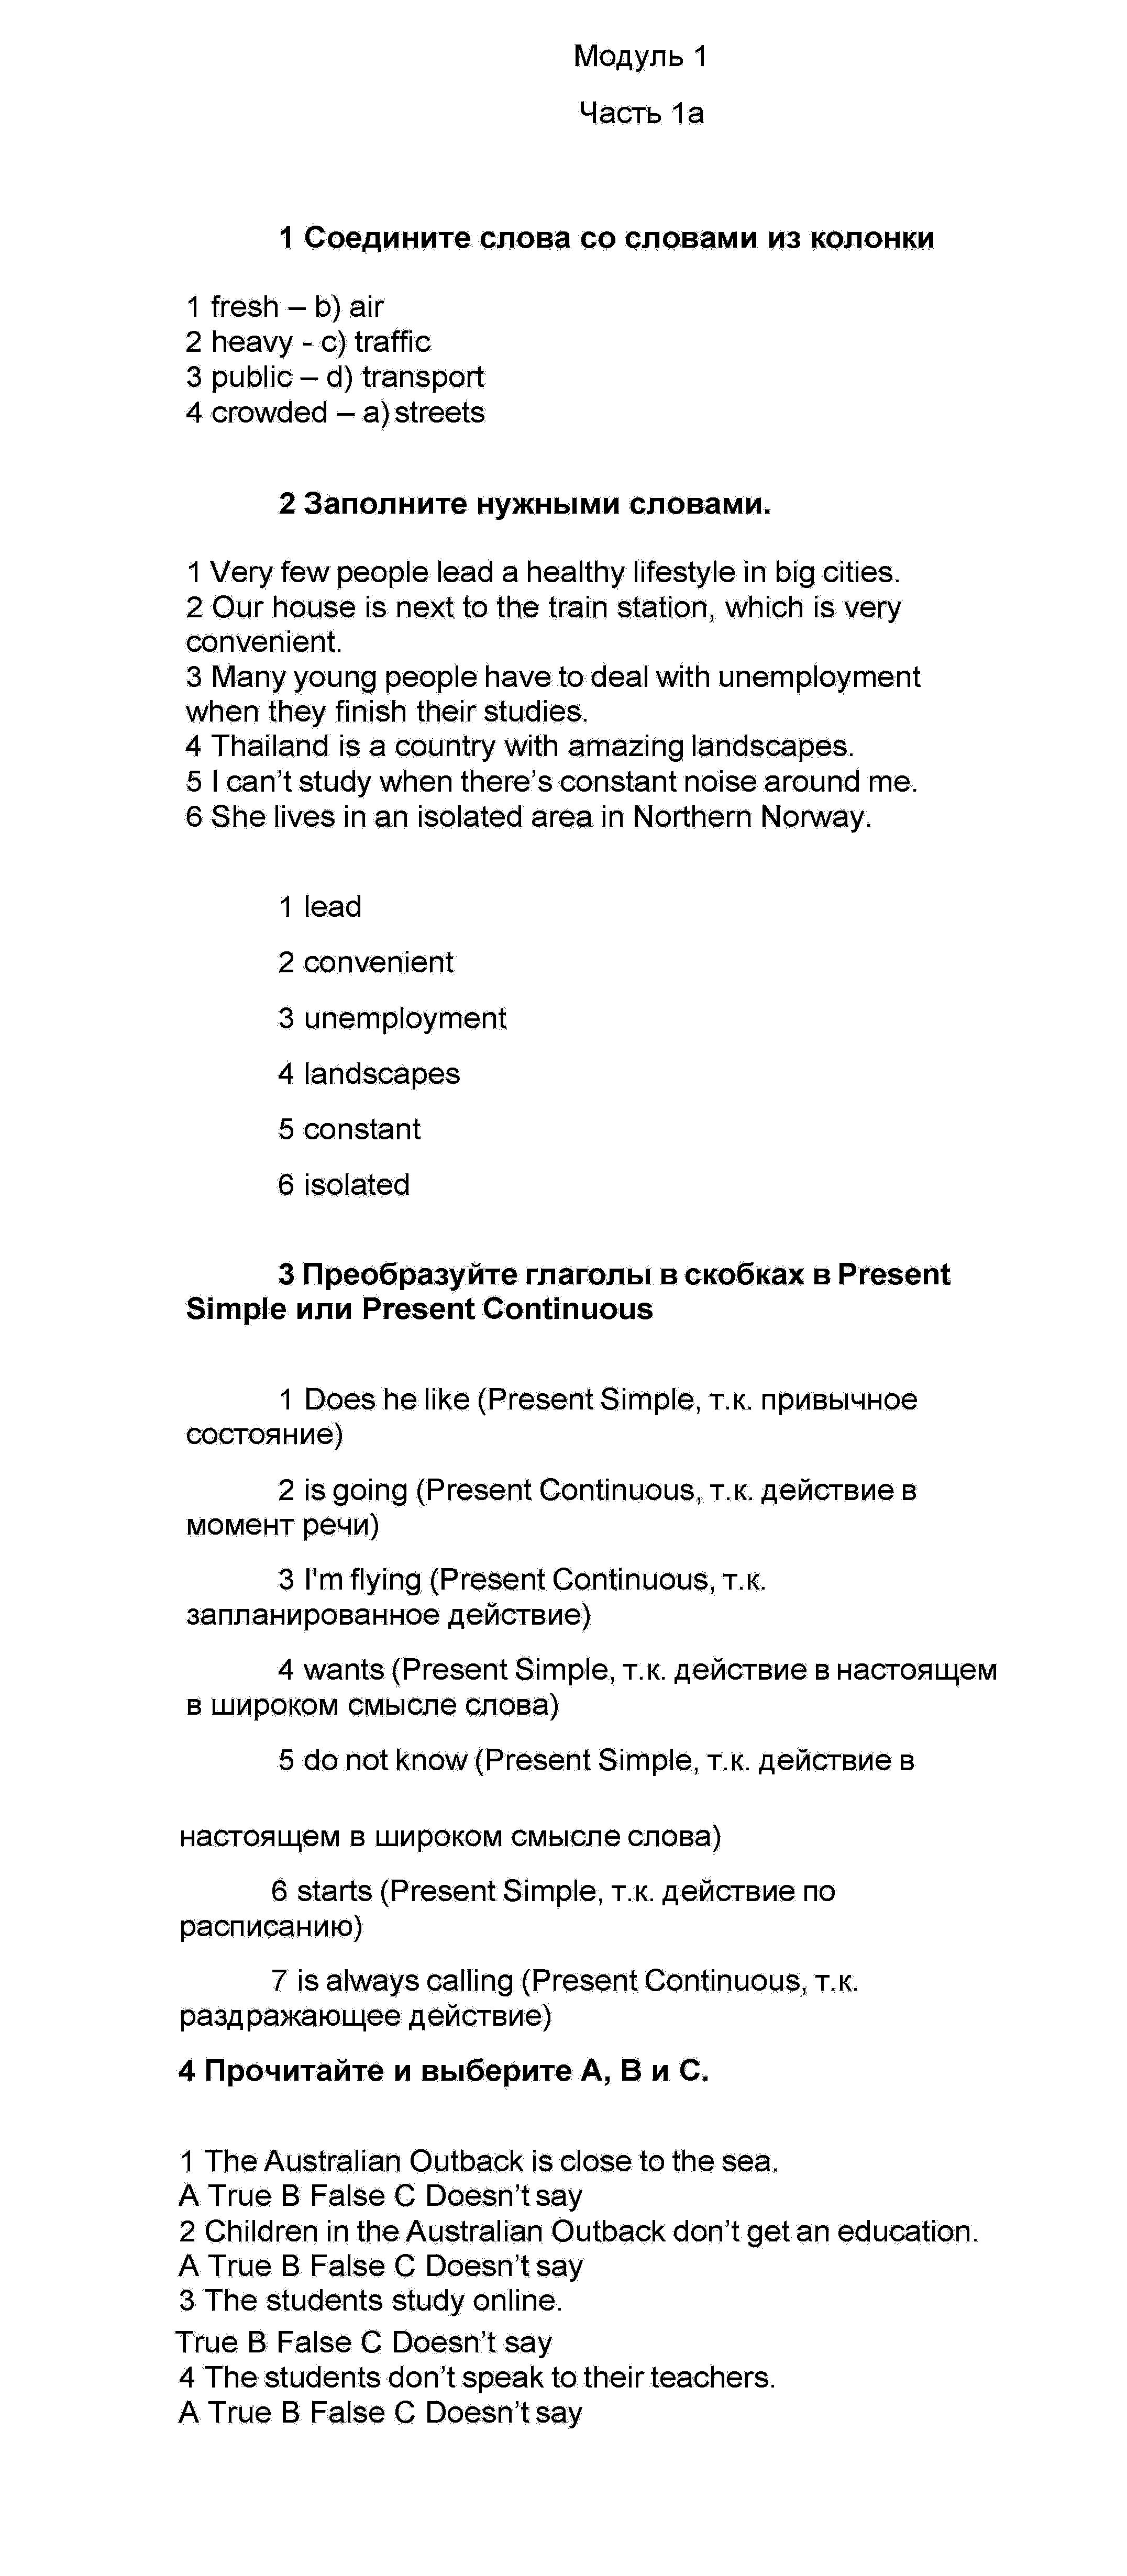 с.5 - решебник №5